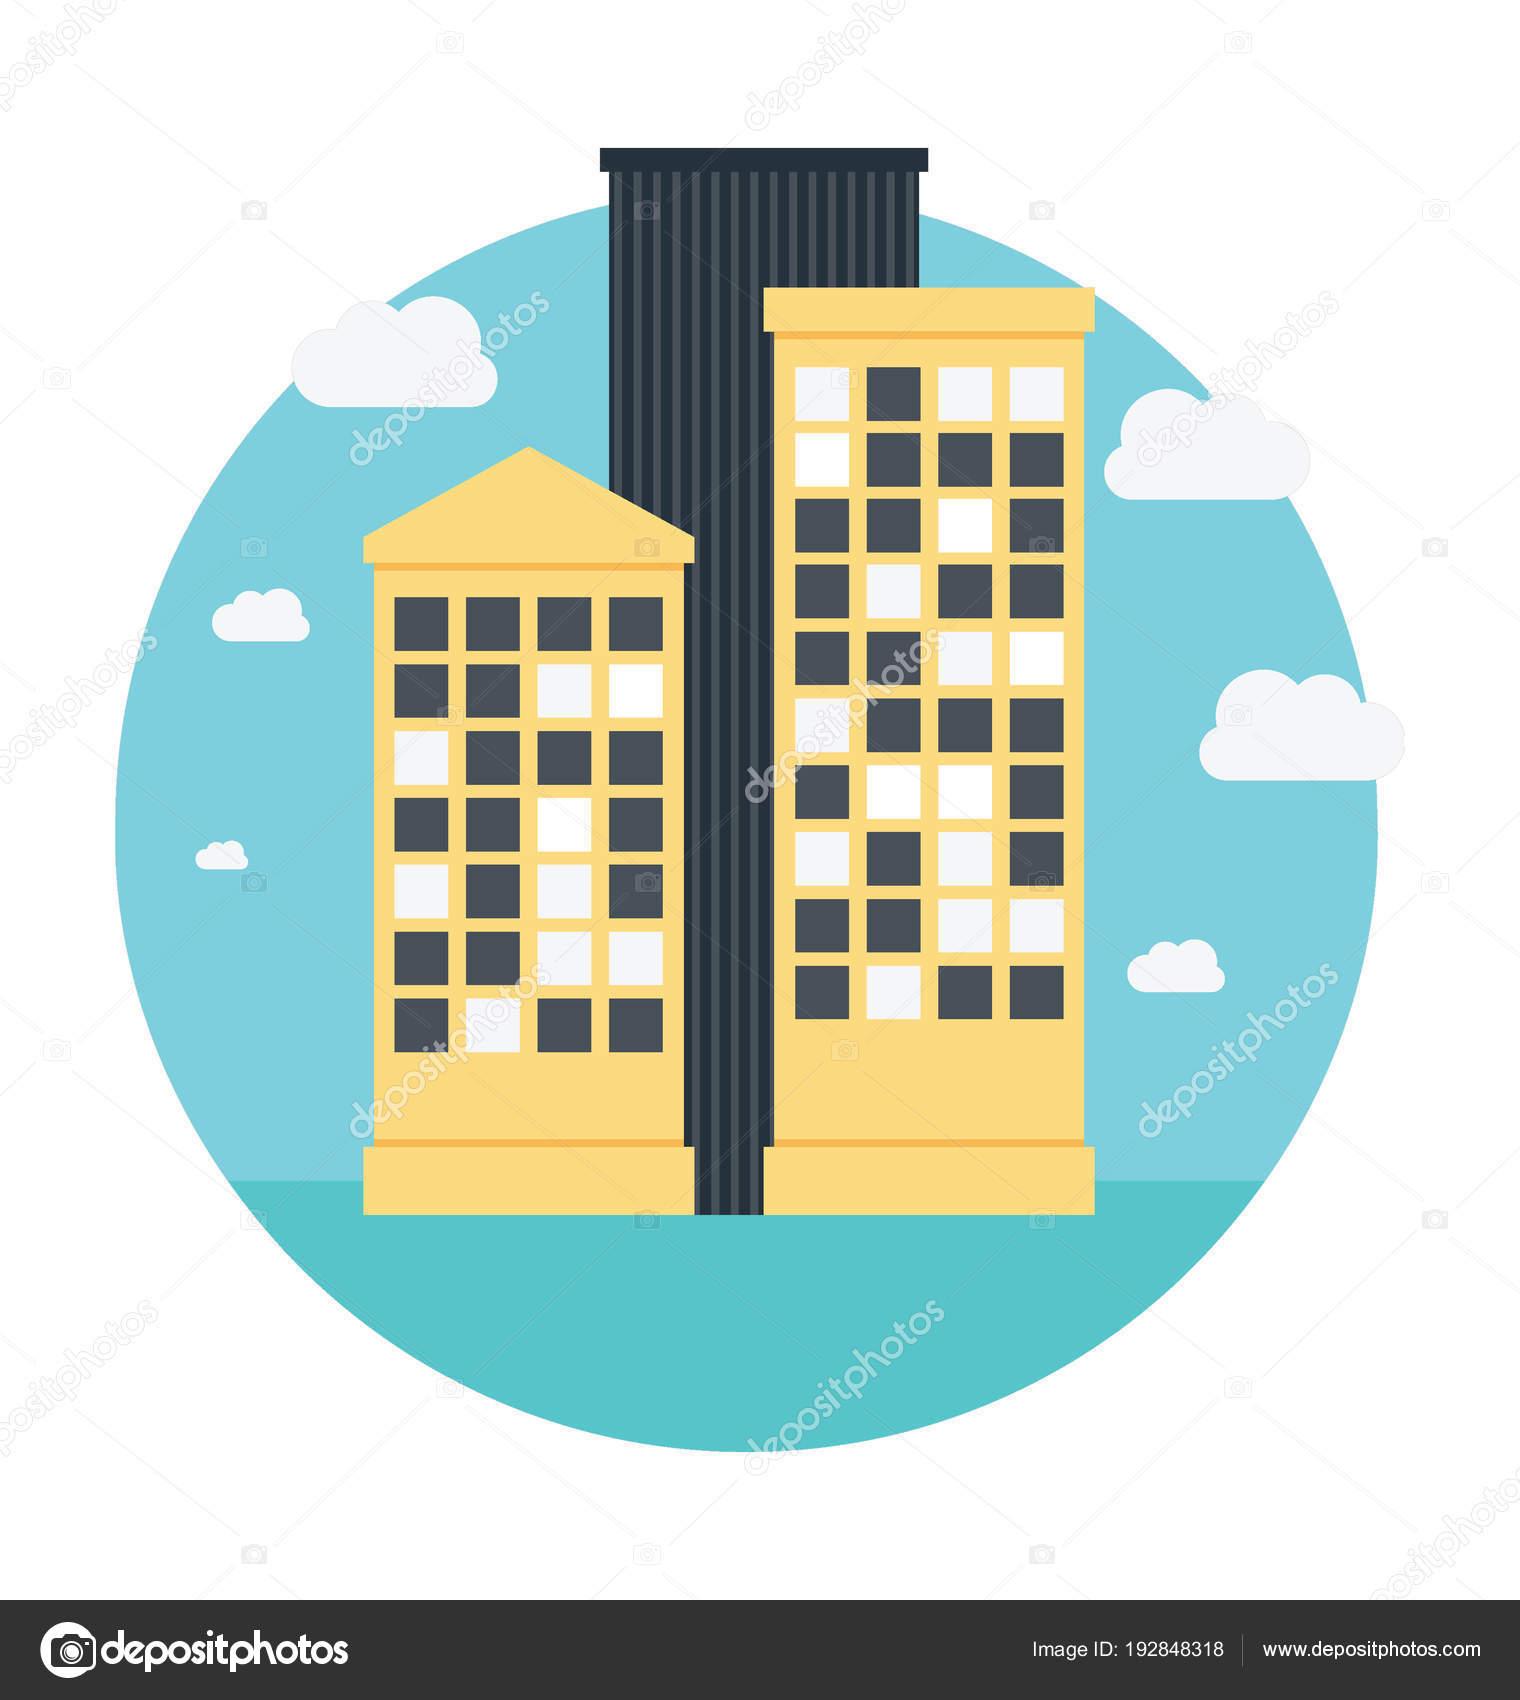 Office Building Flat Icon Design Stock Vector Prosymbols 192848318